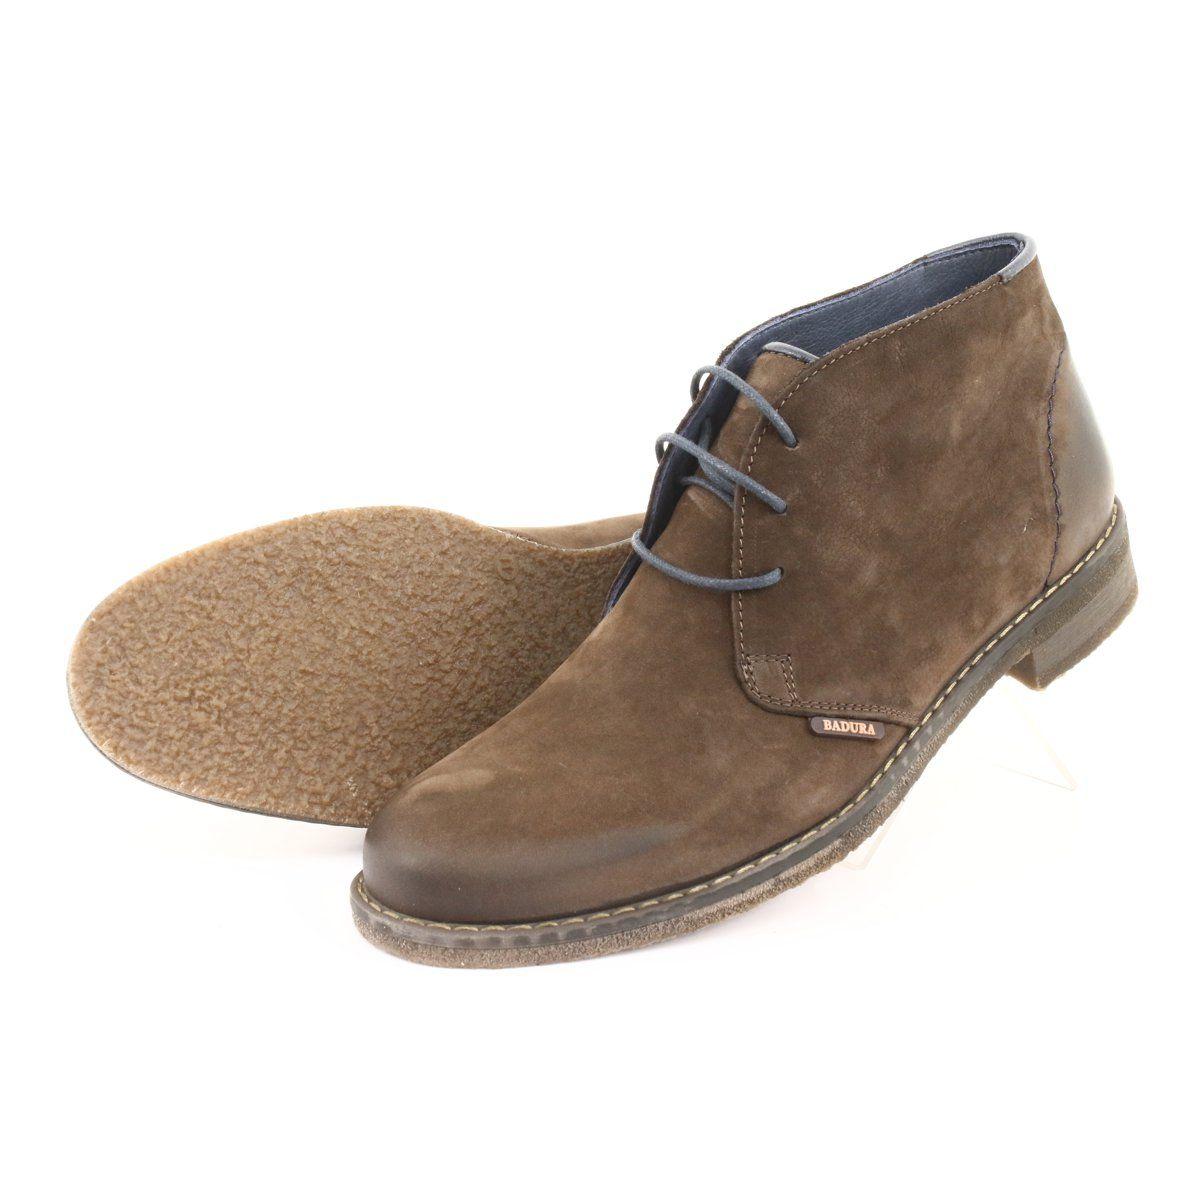 Trzewiki Botki Badura 4753 Brazowe Boots Nubuck Leather Shoes Mens